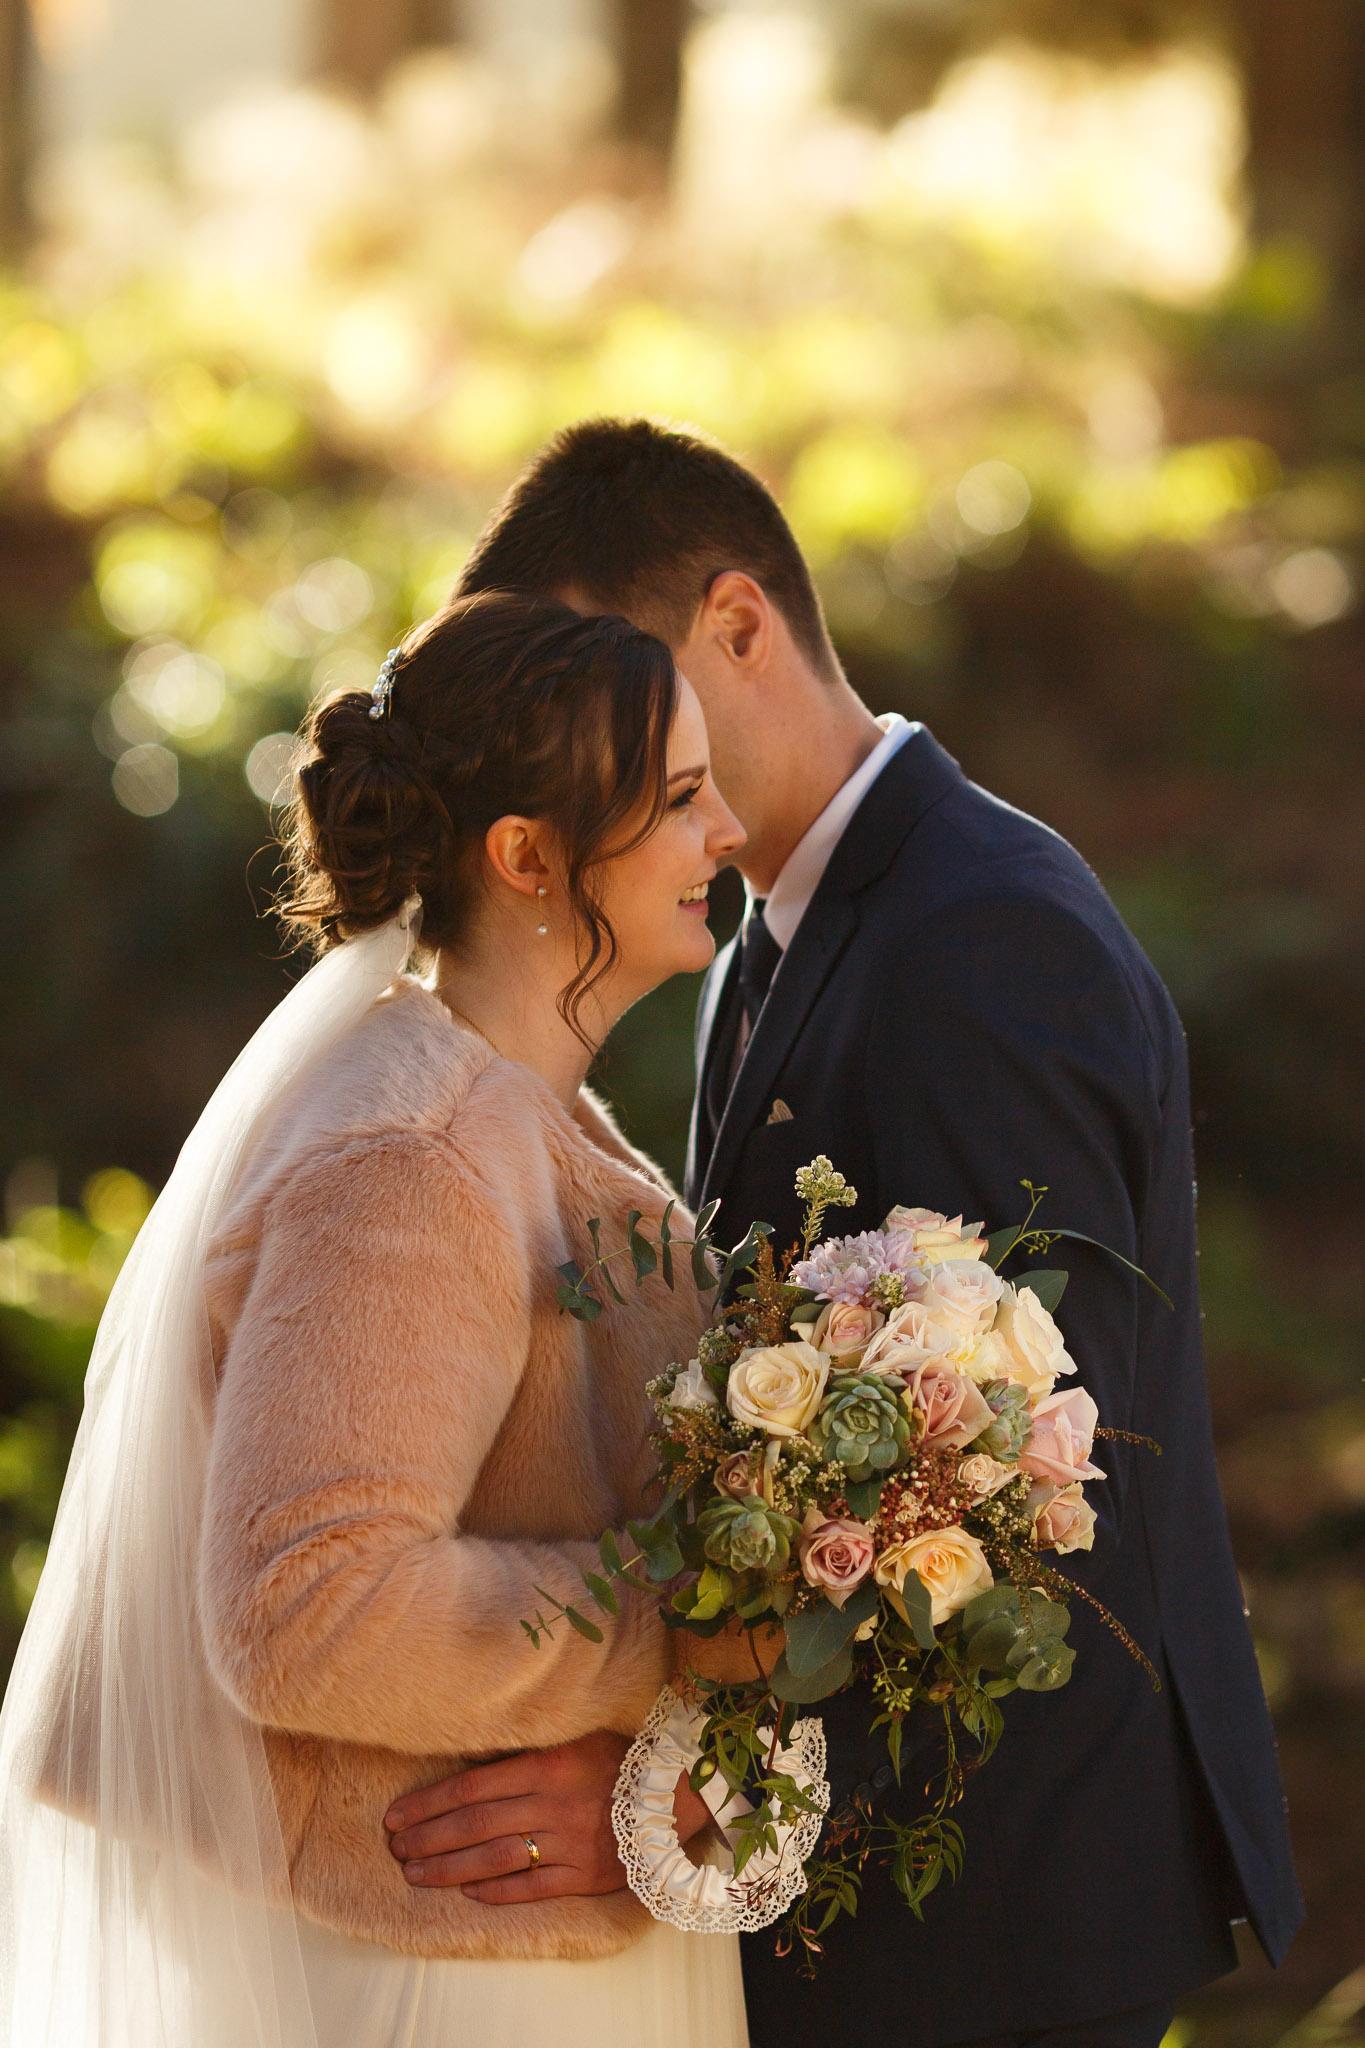 highlight_wedding_photography_manawatu_palmerston_north_new_zealand_rangitikei_golf_ohakea-50.jpg